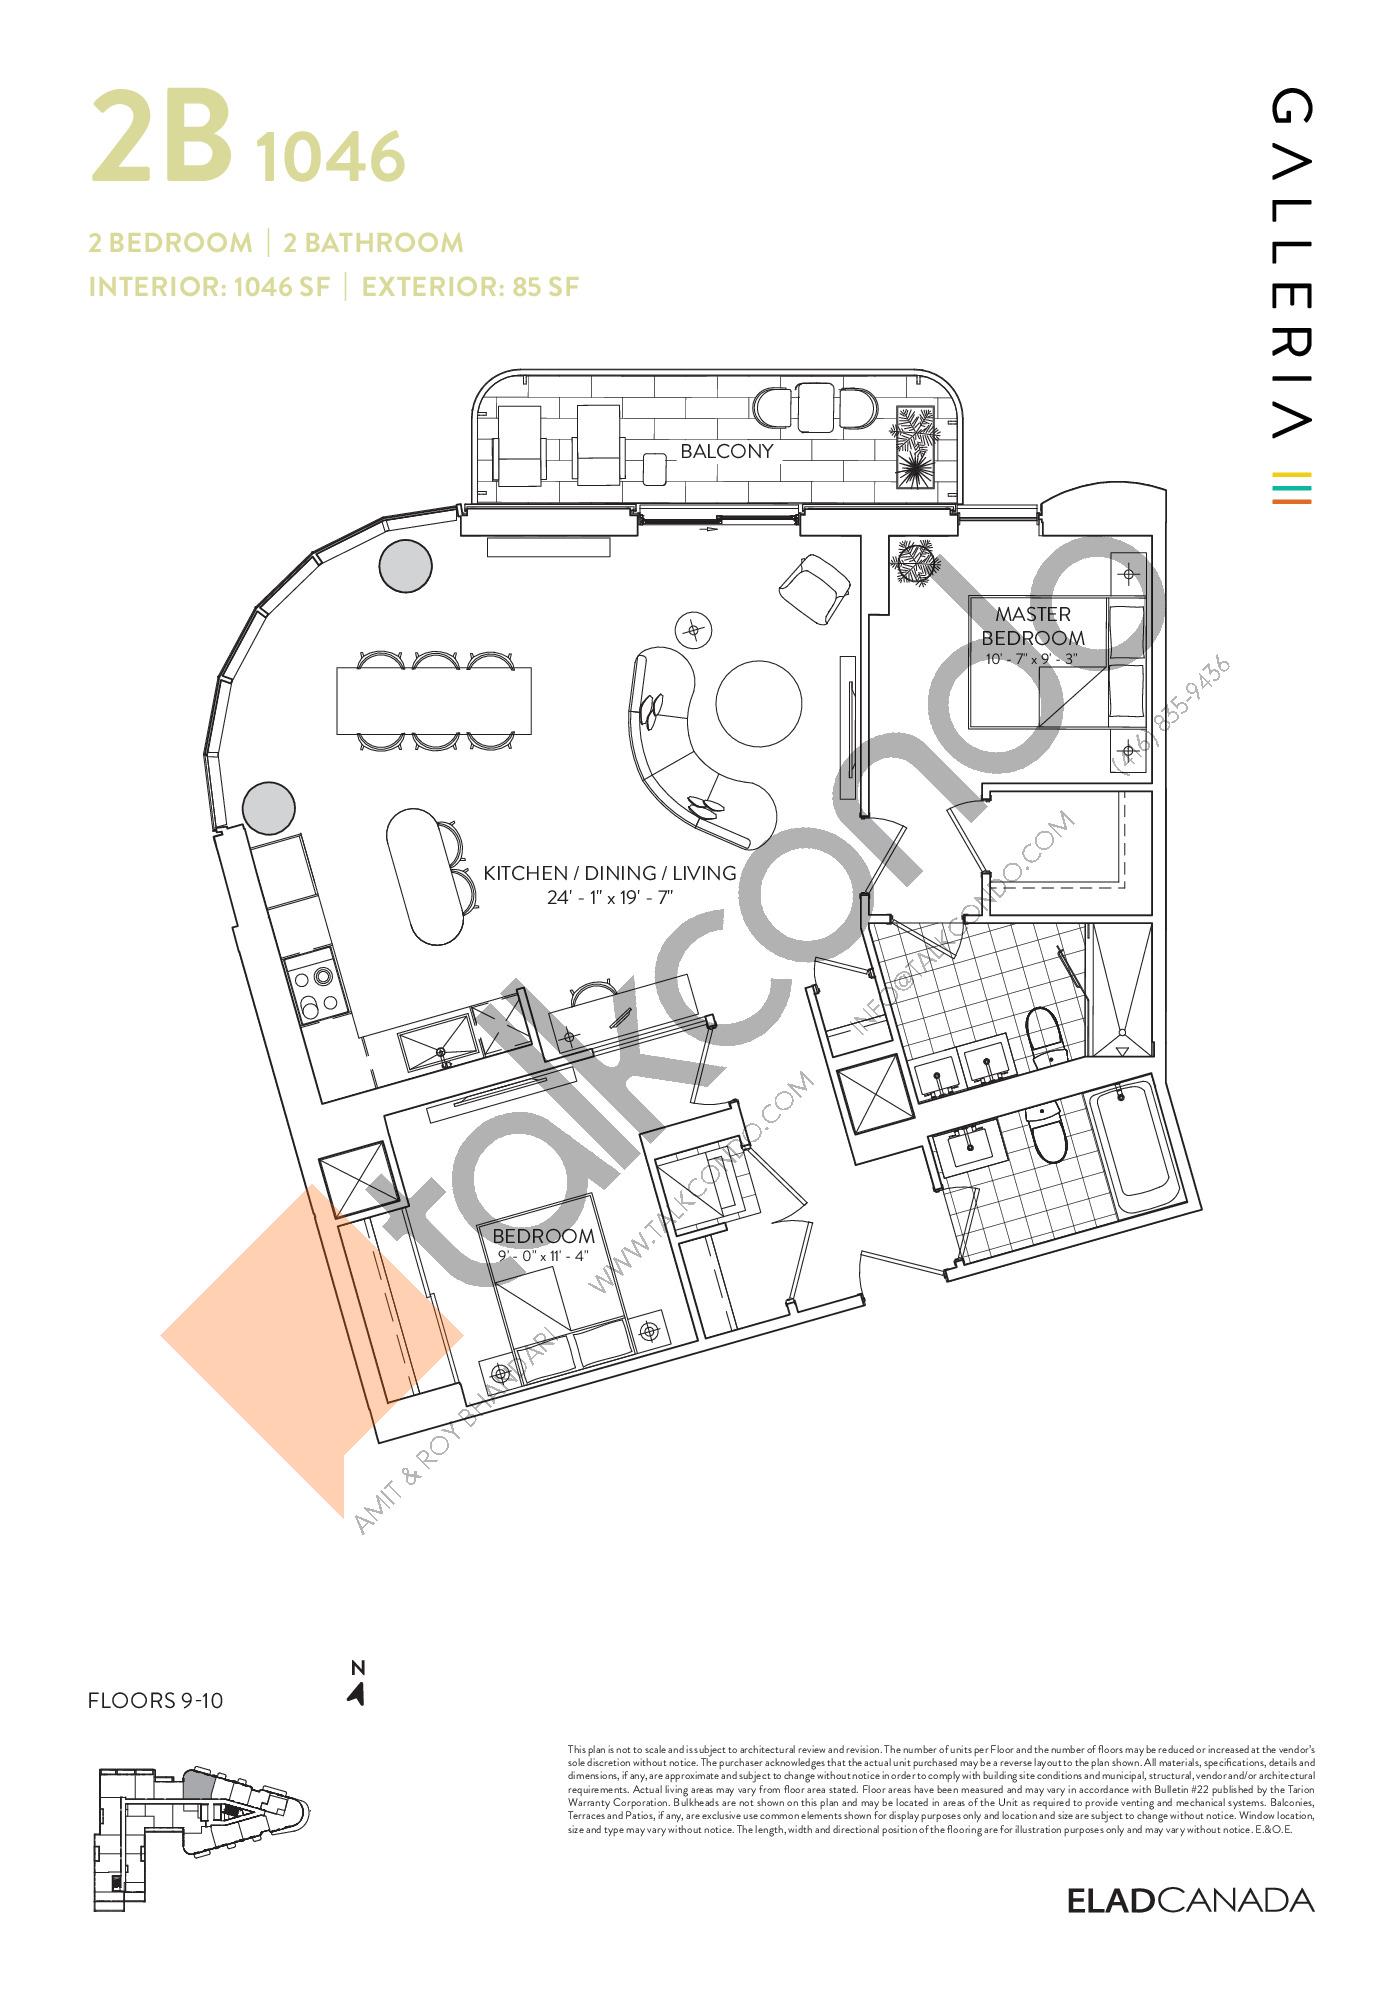 2B 1046 Floor Plan at Galleria 03 Condos - 1046 sq.ft